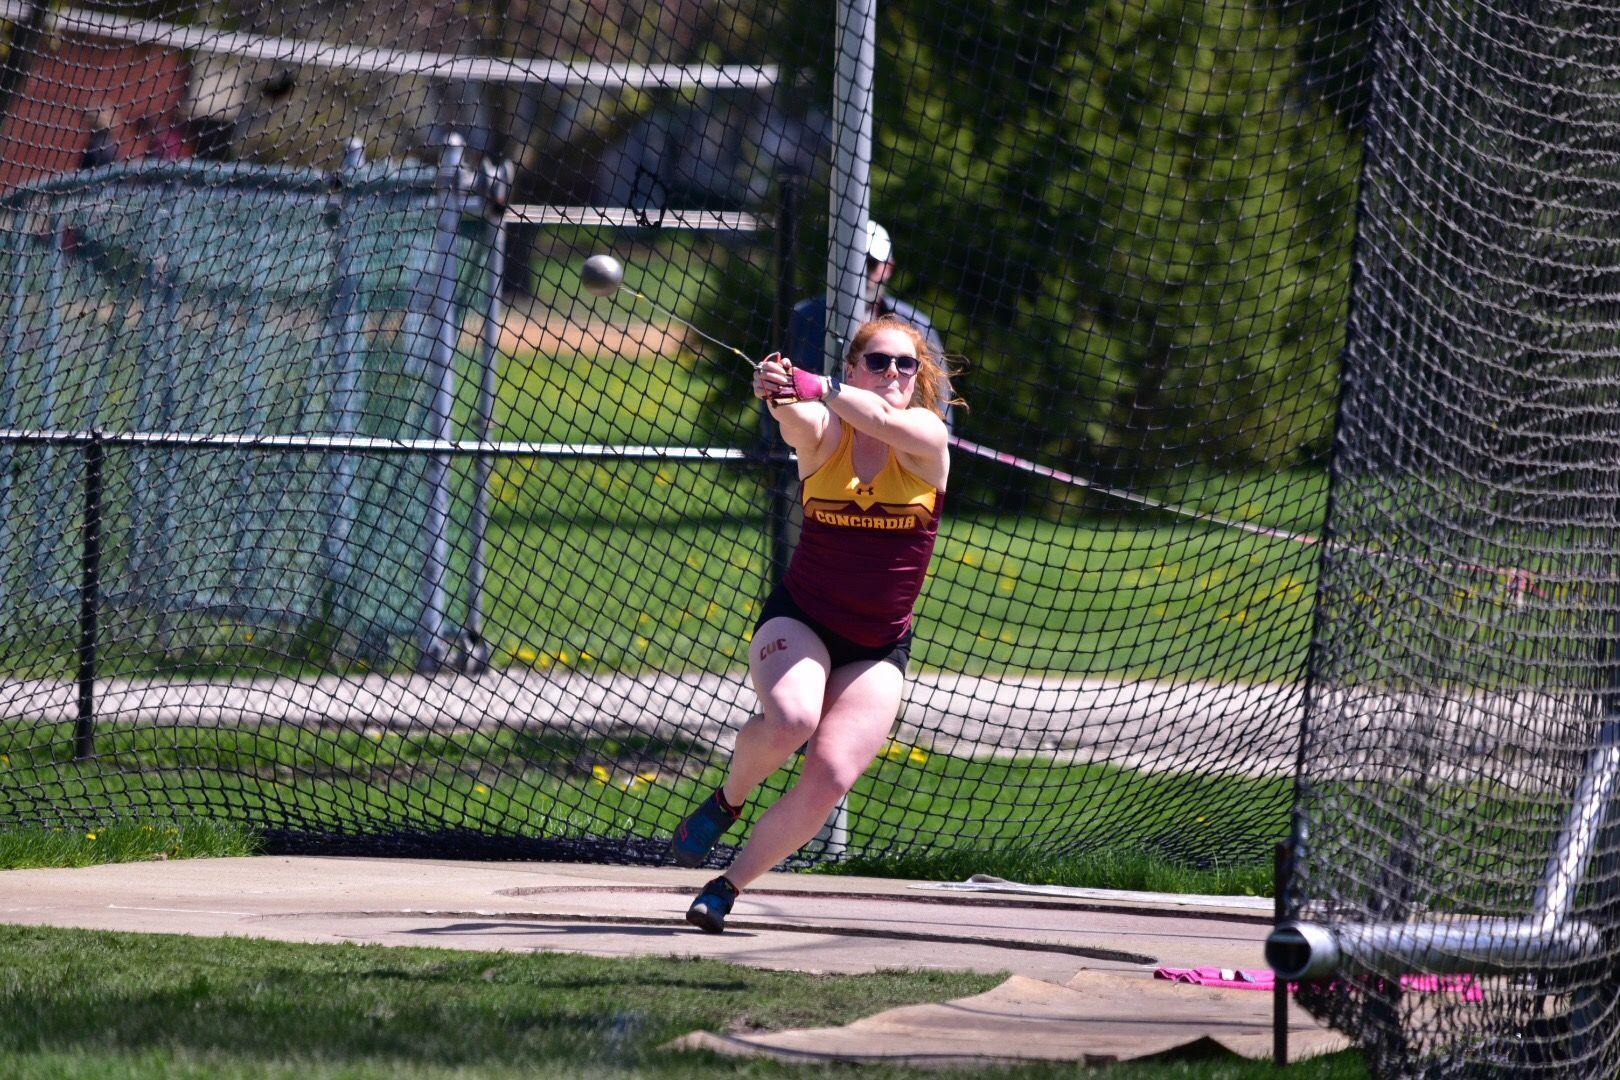 Jessica wilsons national qualifier highlights cuc womens